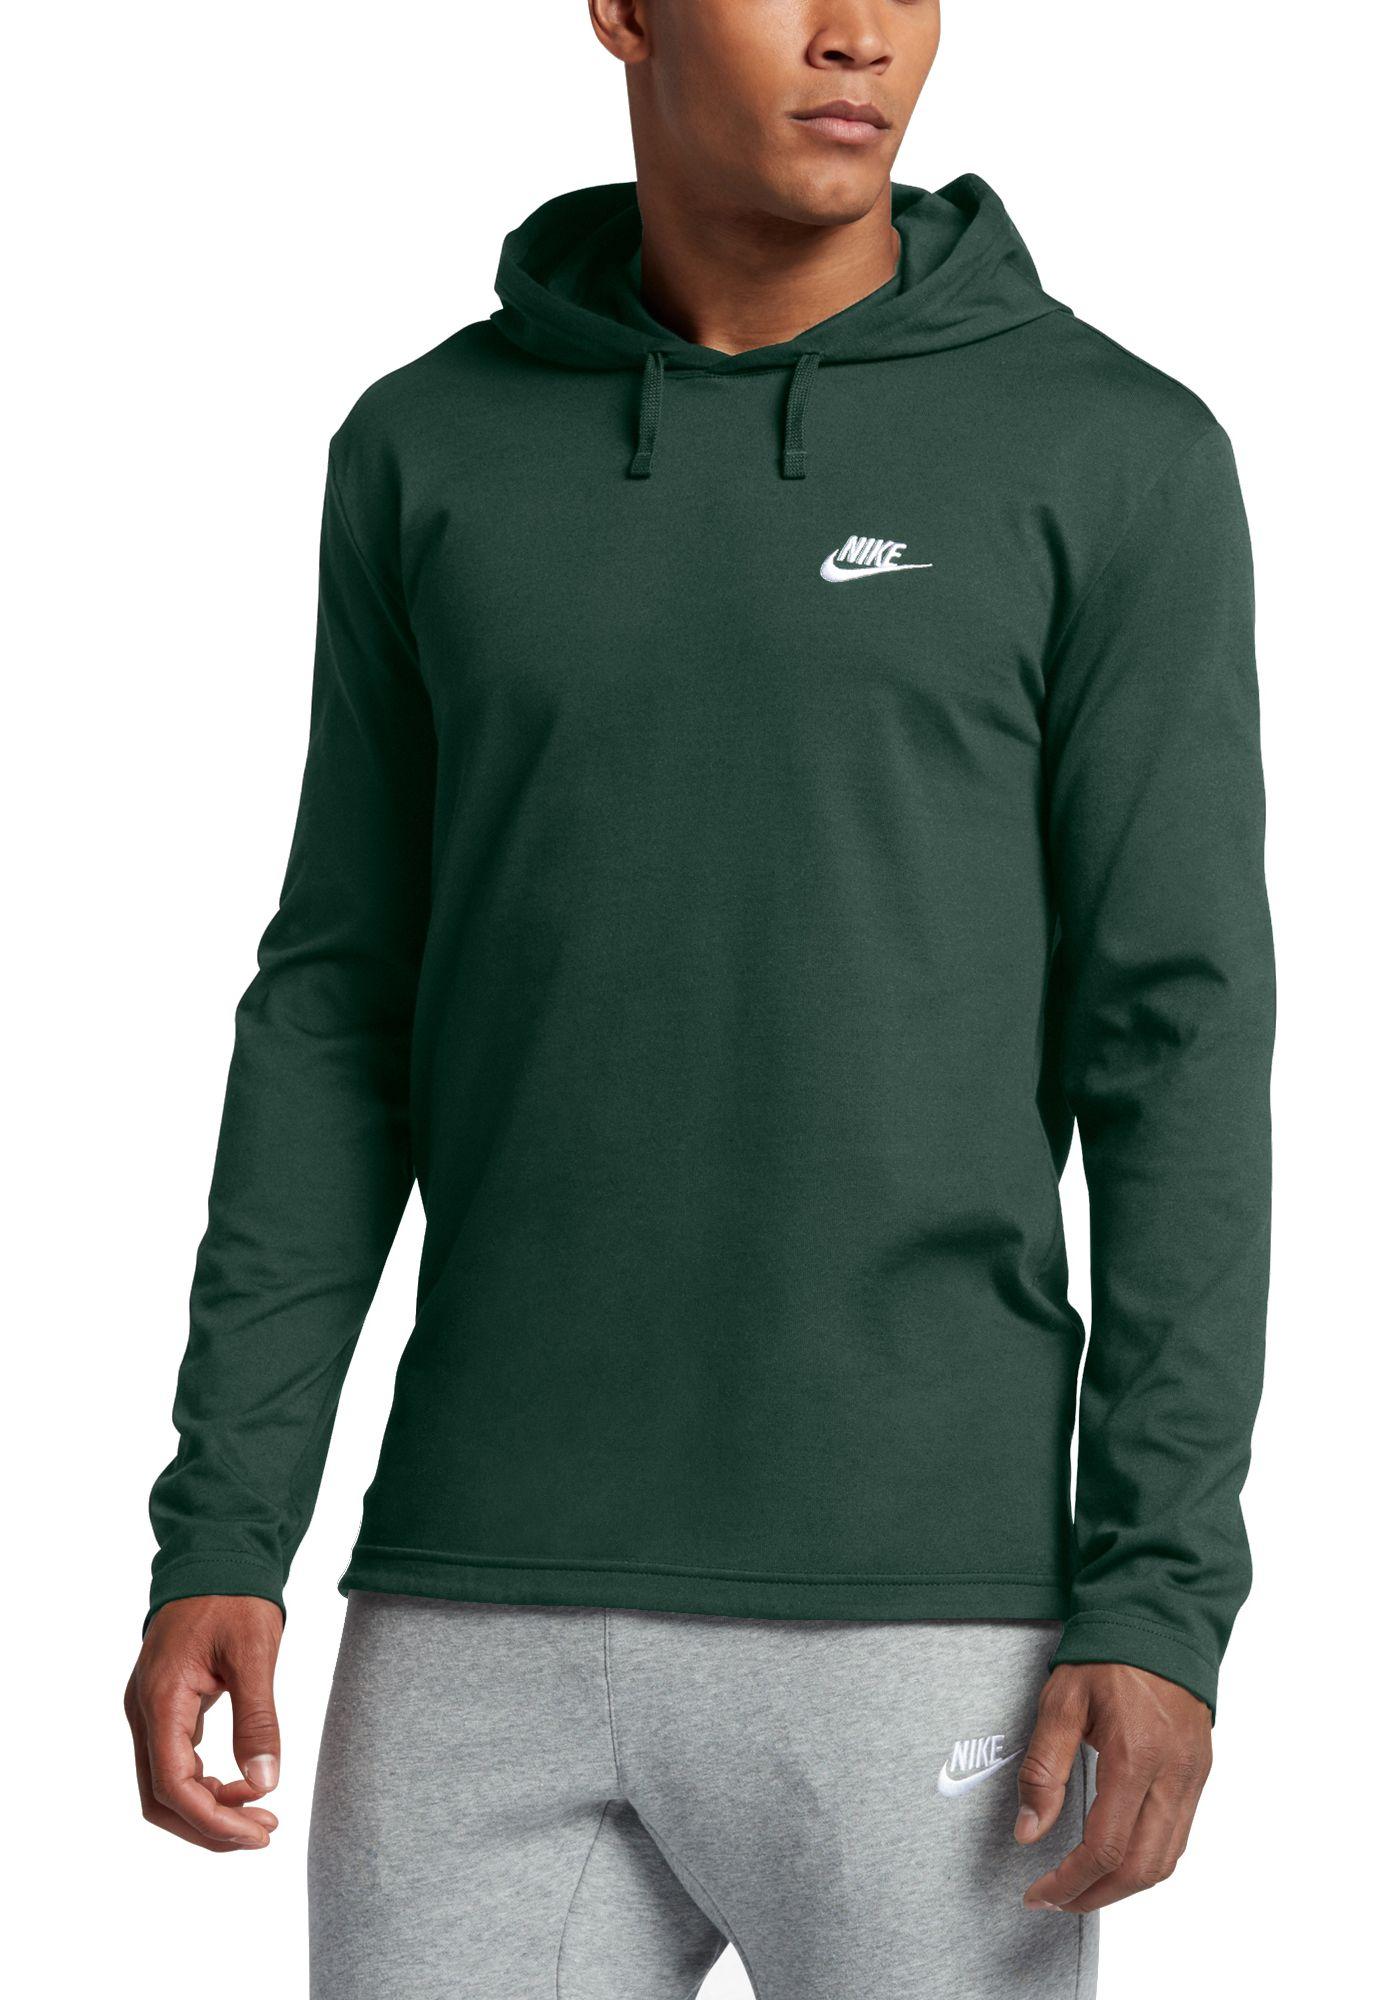 Nike Men's Jersey Lightweight Pullover Hoodie